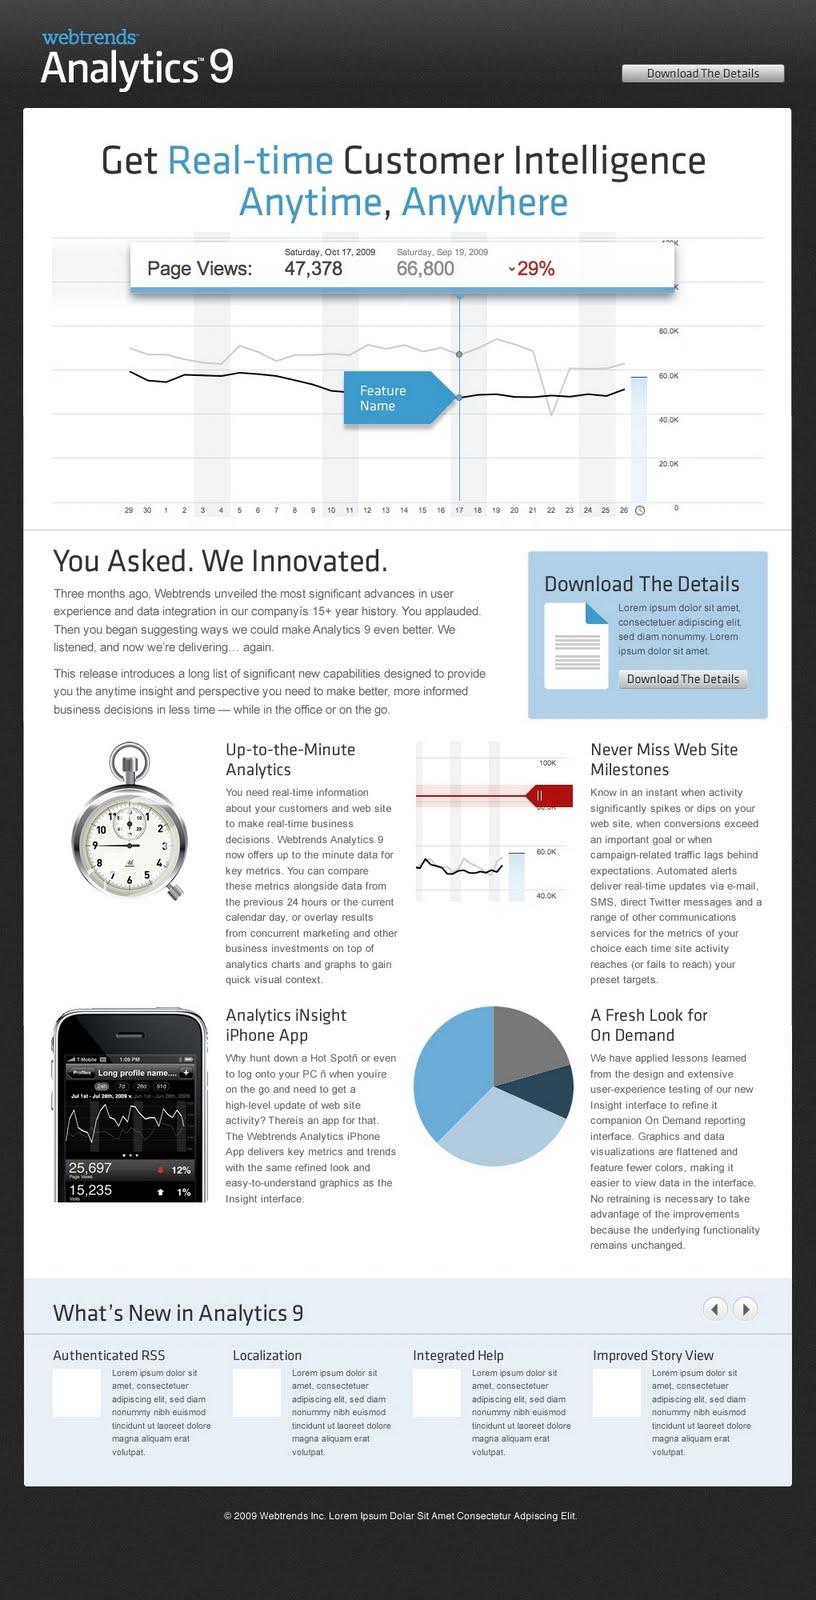 Webtrends Software - WebTrends - Analytics - Analytics 9